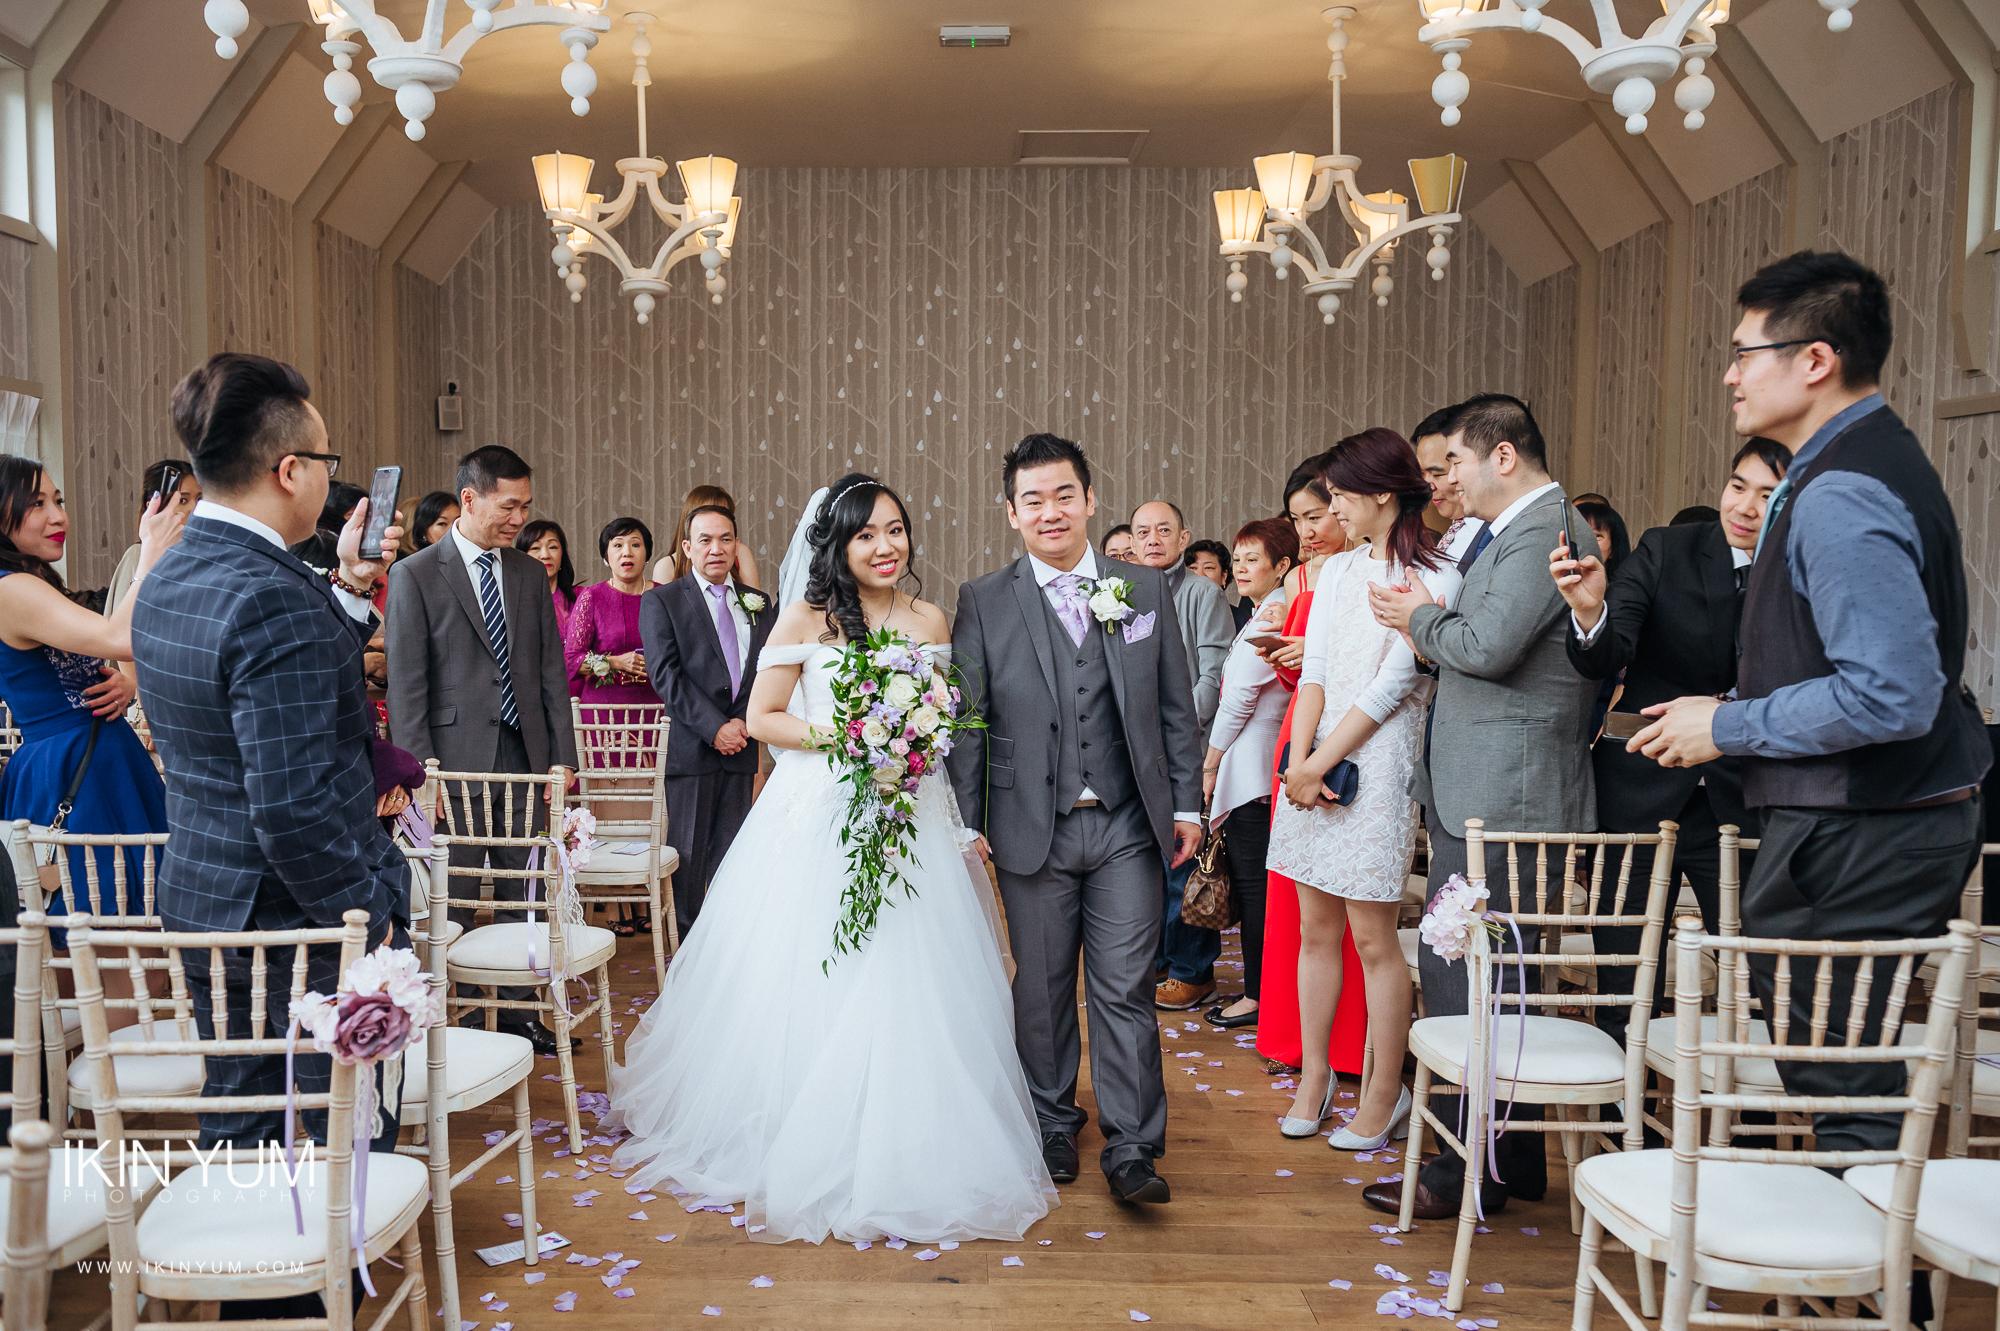 Hampton Manor Wedding - Ikin Yum Photography -092.jpg